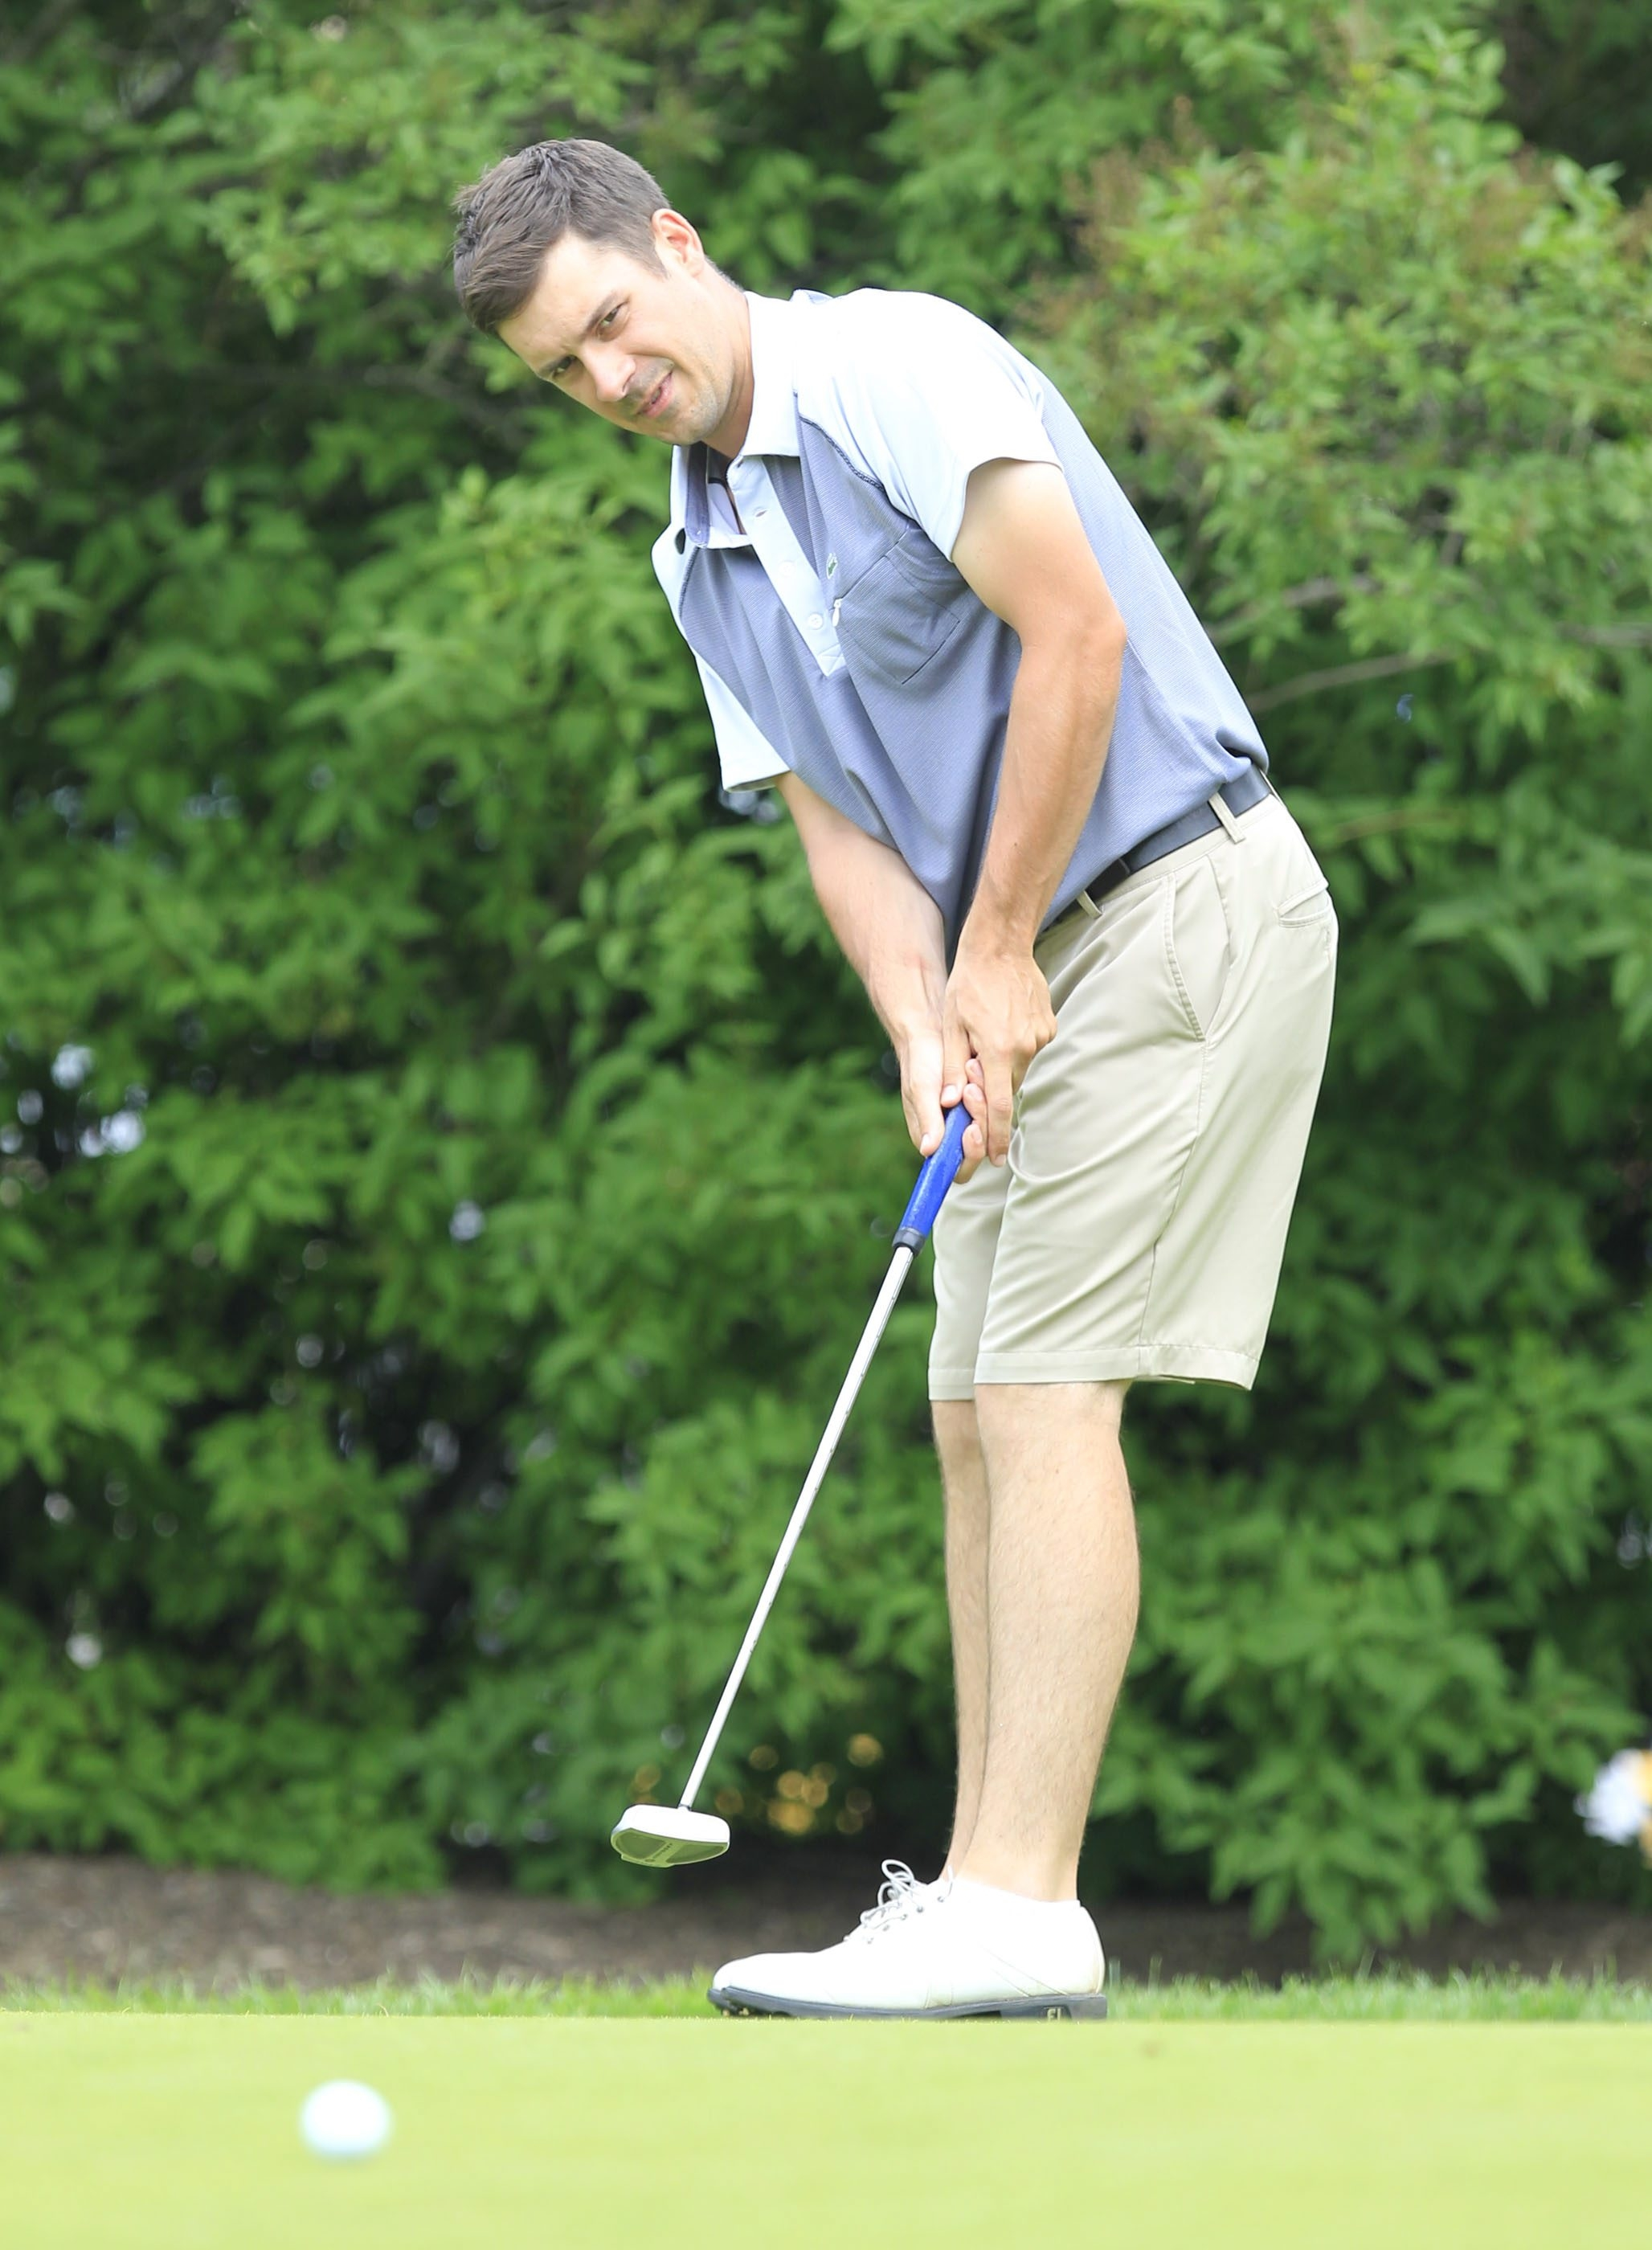 Patrick Sheedy Jr. knows he can shoot a low score at Niagara Falls Country Club.